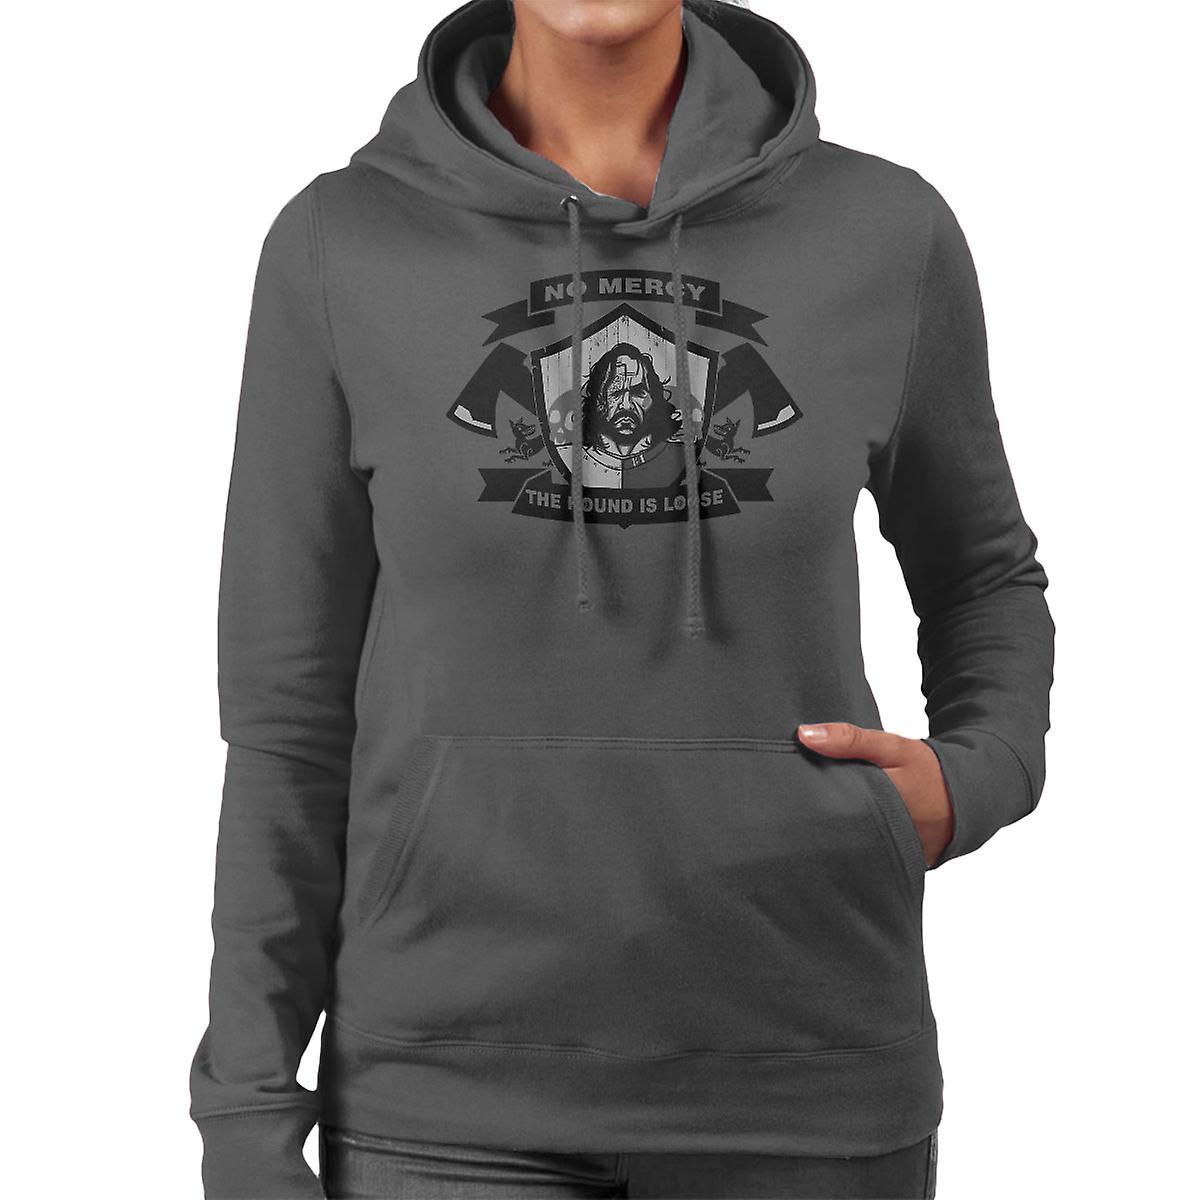 No Mercy The Hound Is Loose Sandor Clegane Game Of Thrones Women's Hooded Sweatshirt